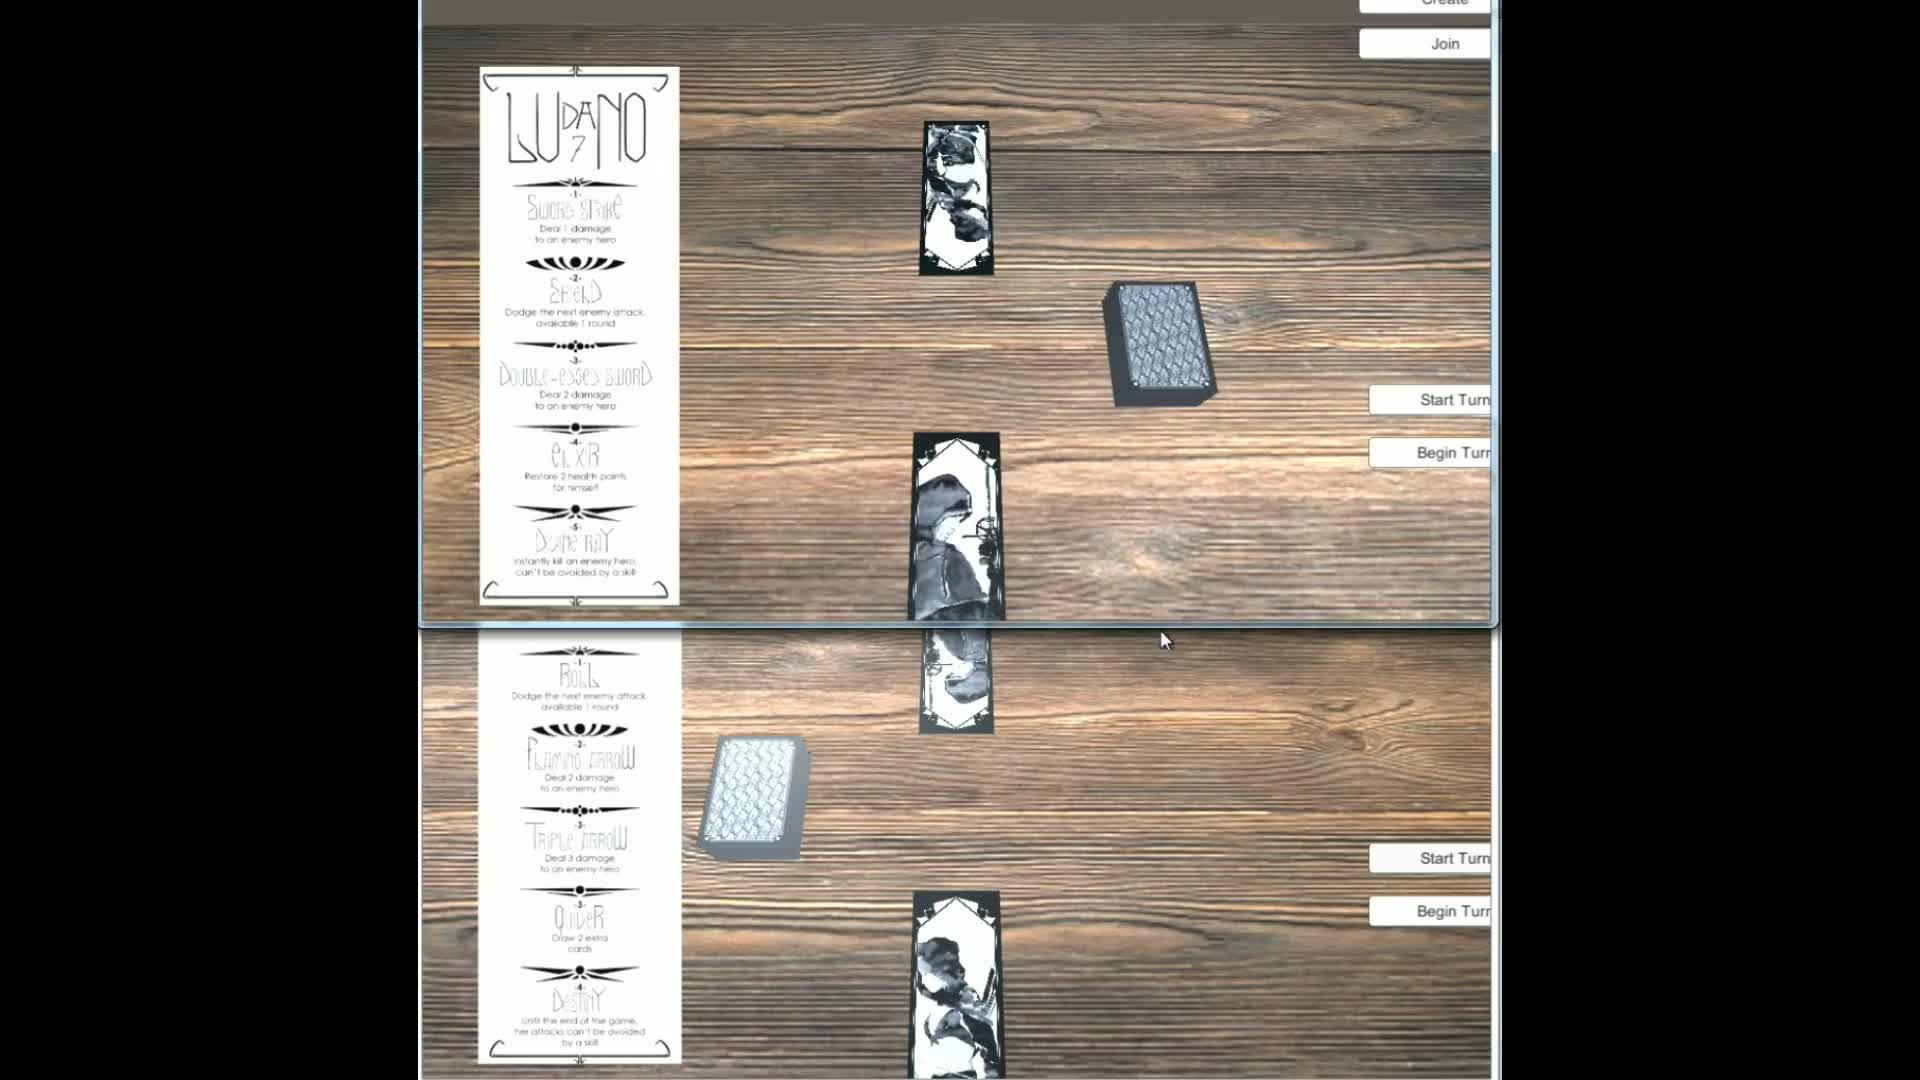 lho-multiplayer GIFs